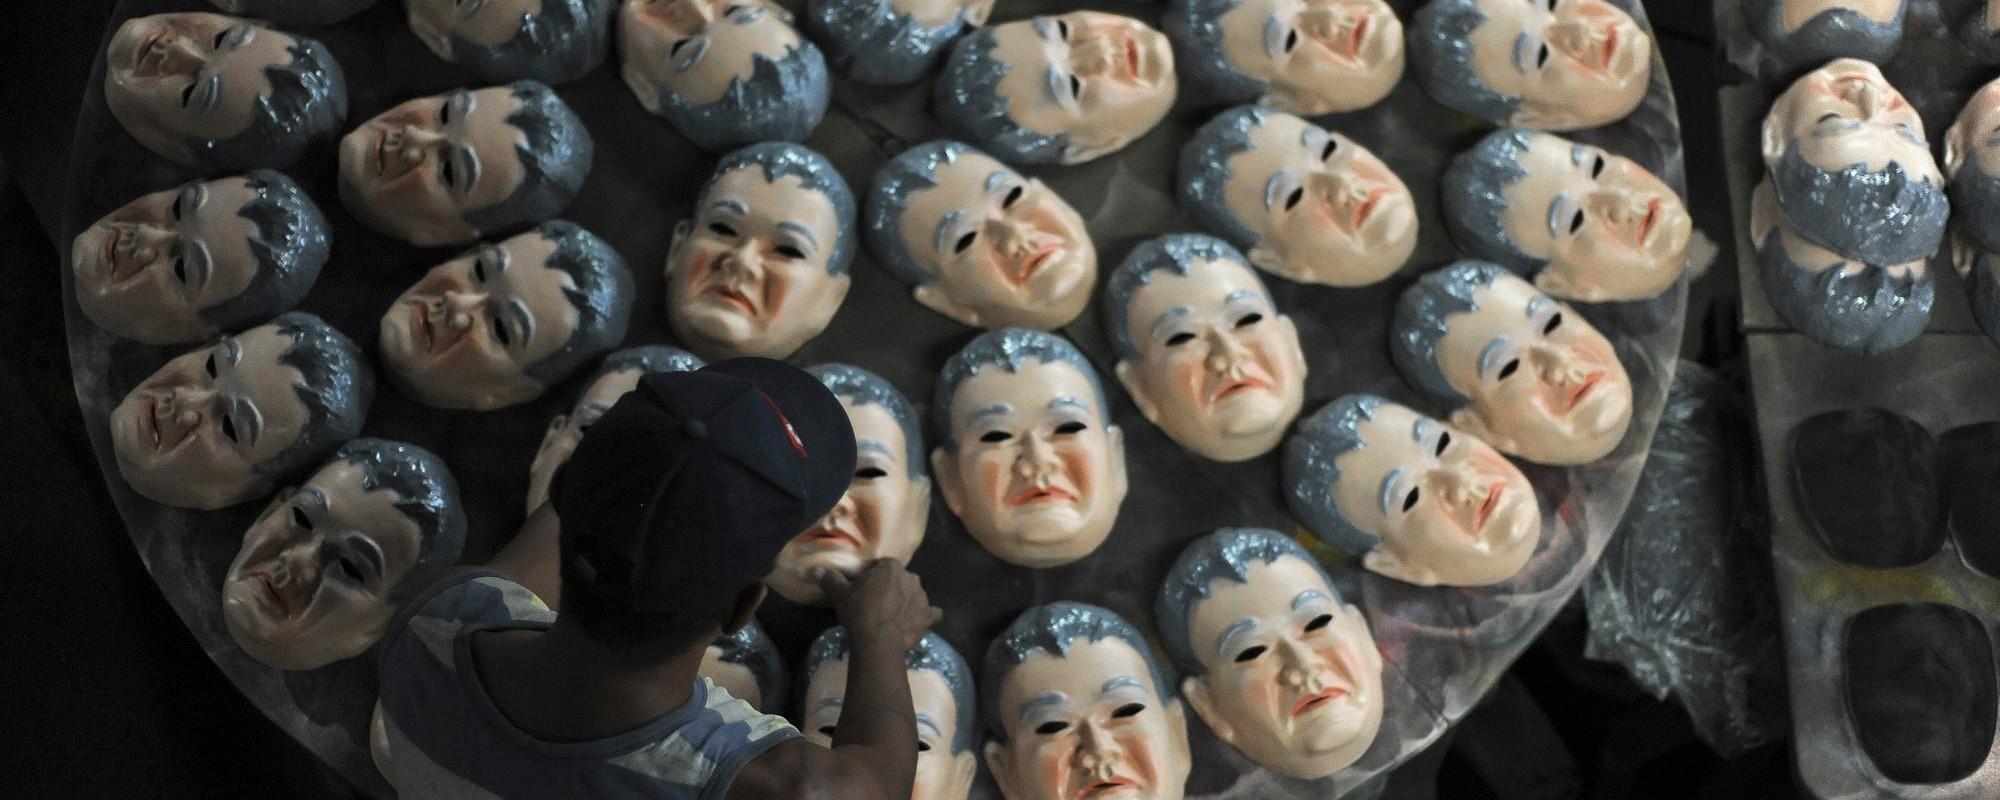 "Conhecendo a fábrica que produz máscaras do Cunha e do ""Japonês da Federal"""